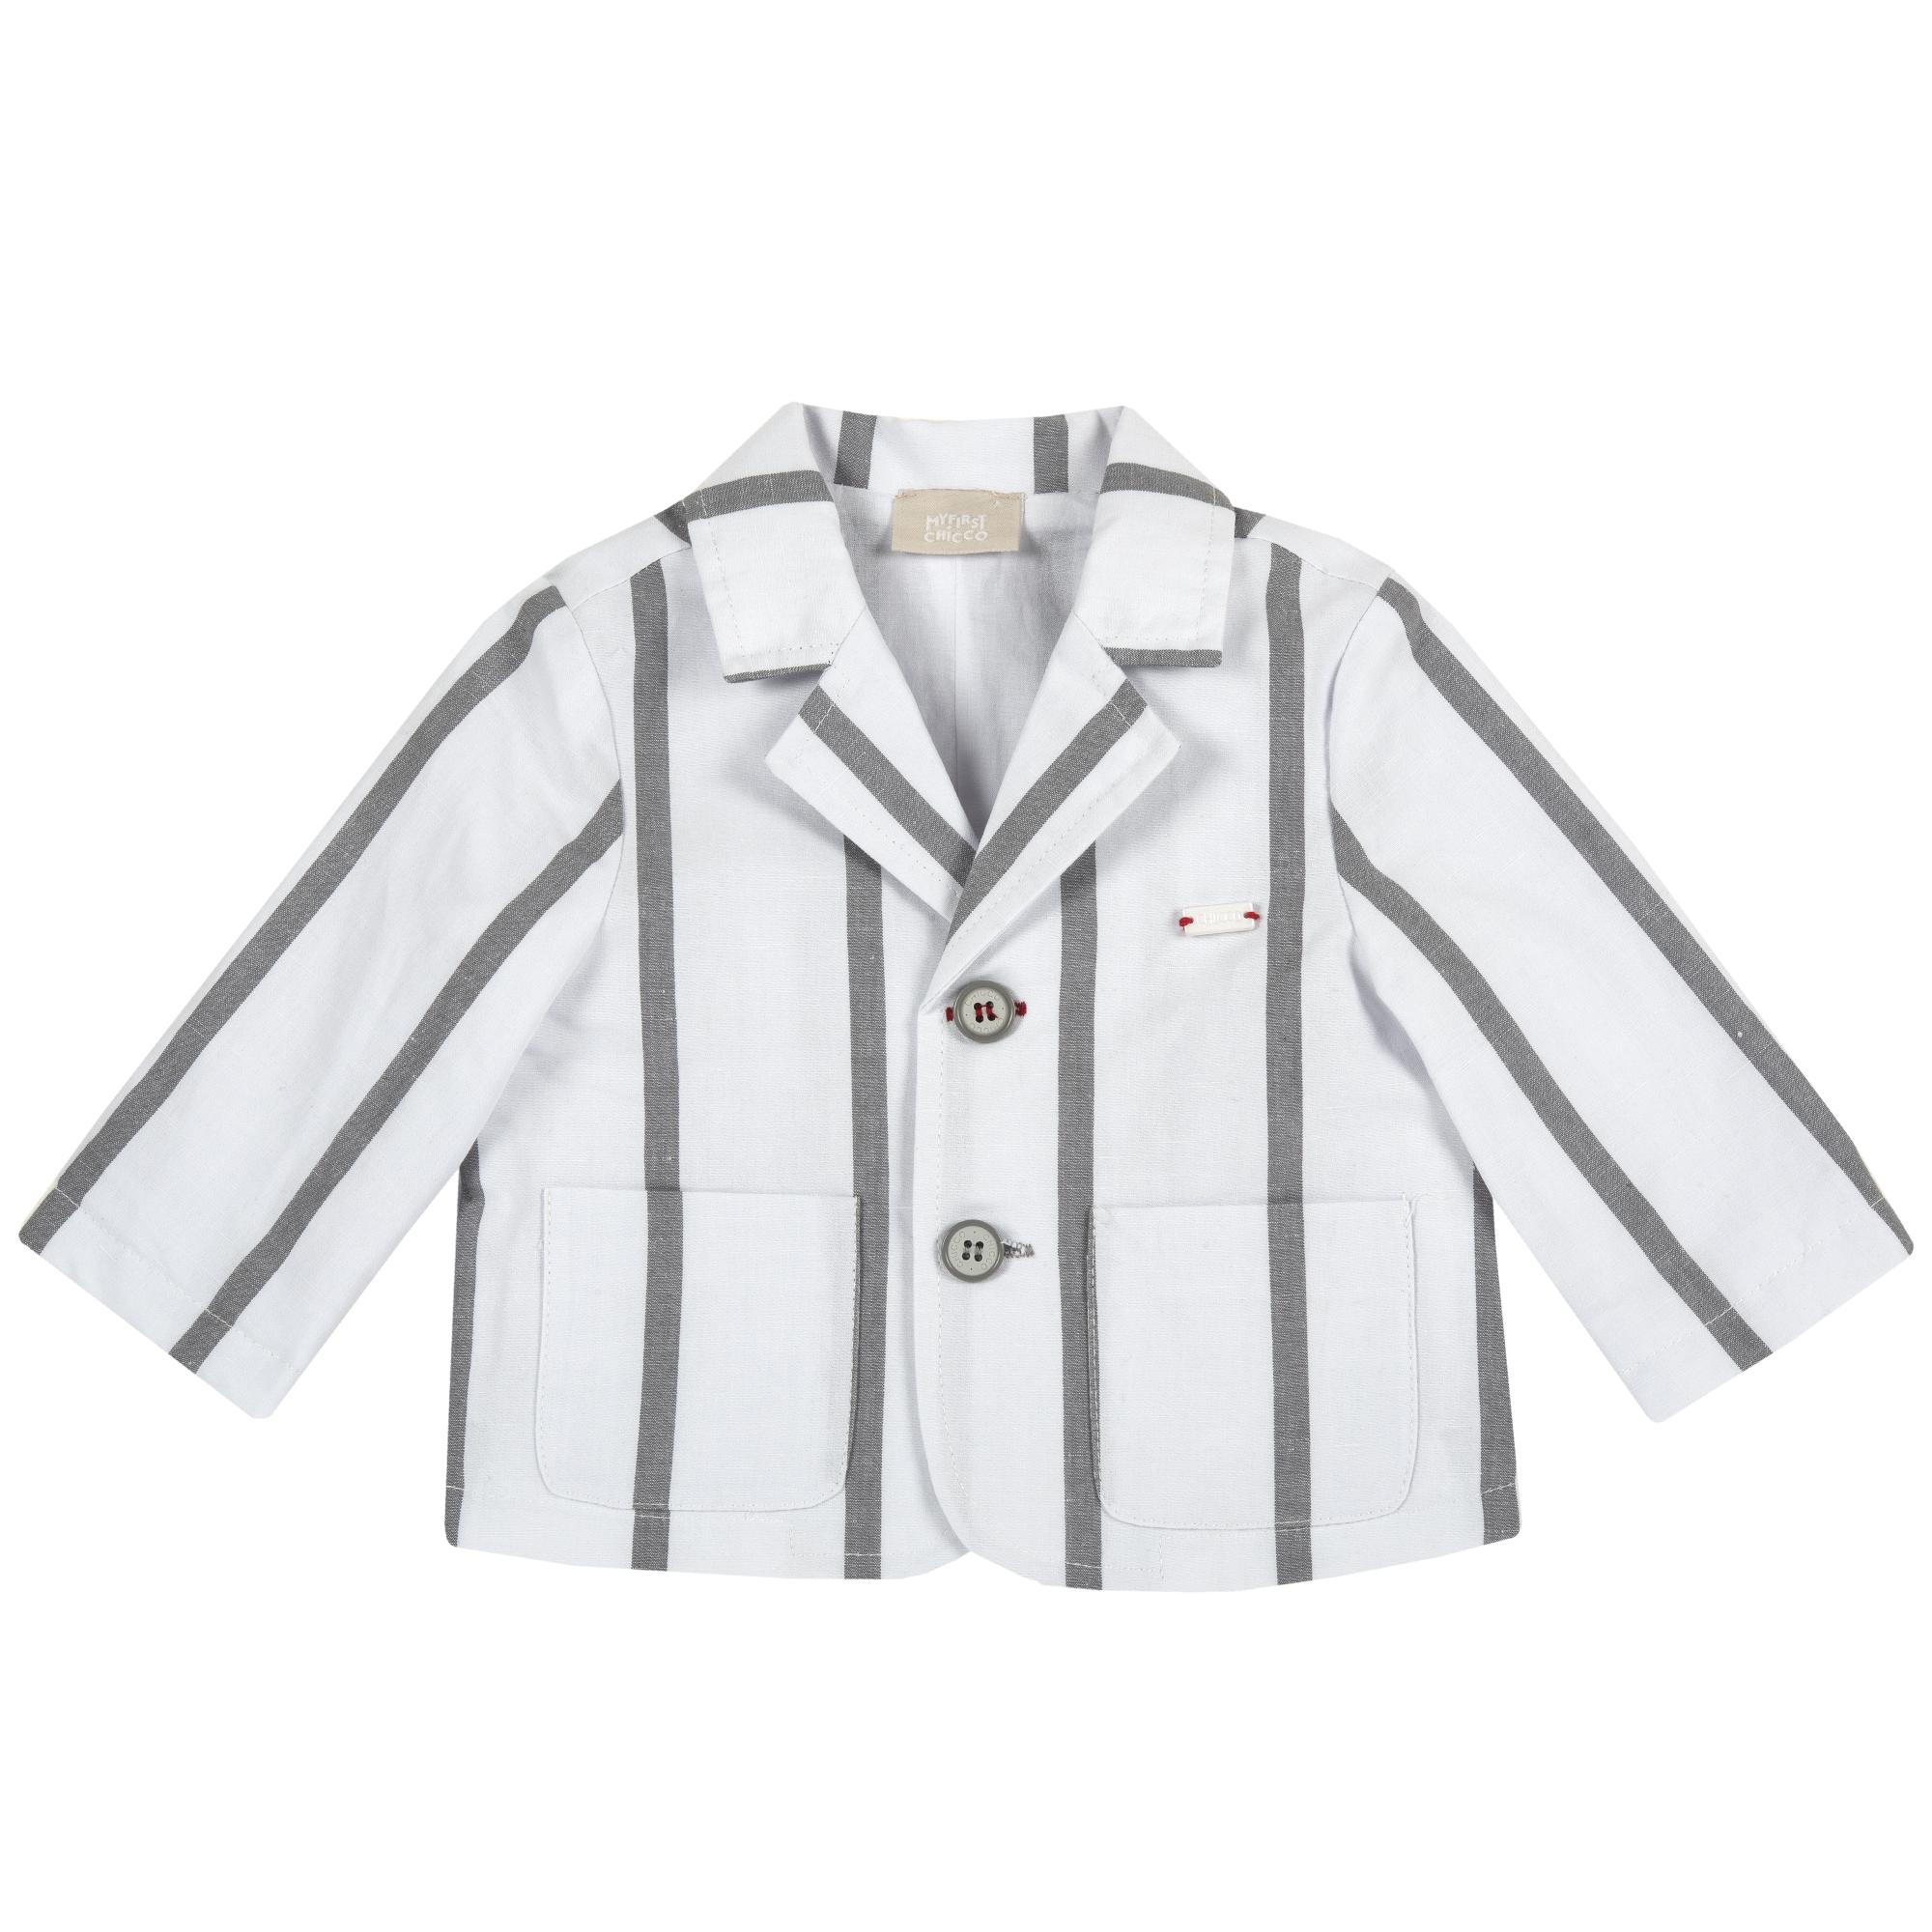 Jacheta copii Chicco tip sacou, alb, 84346